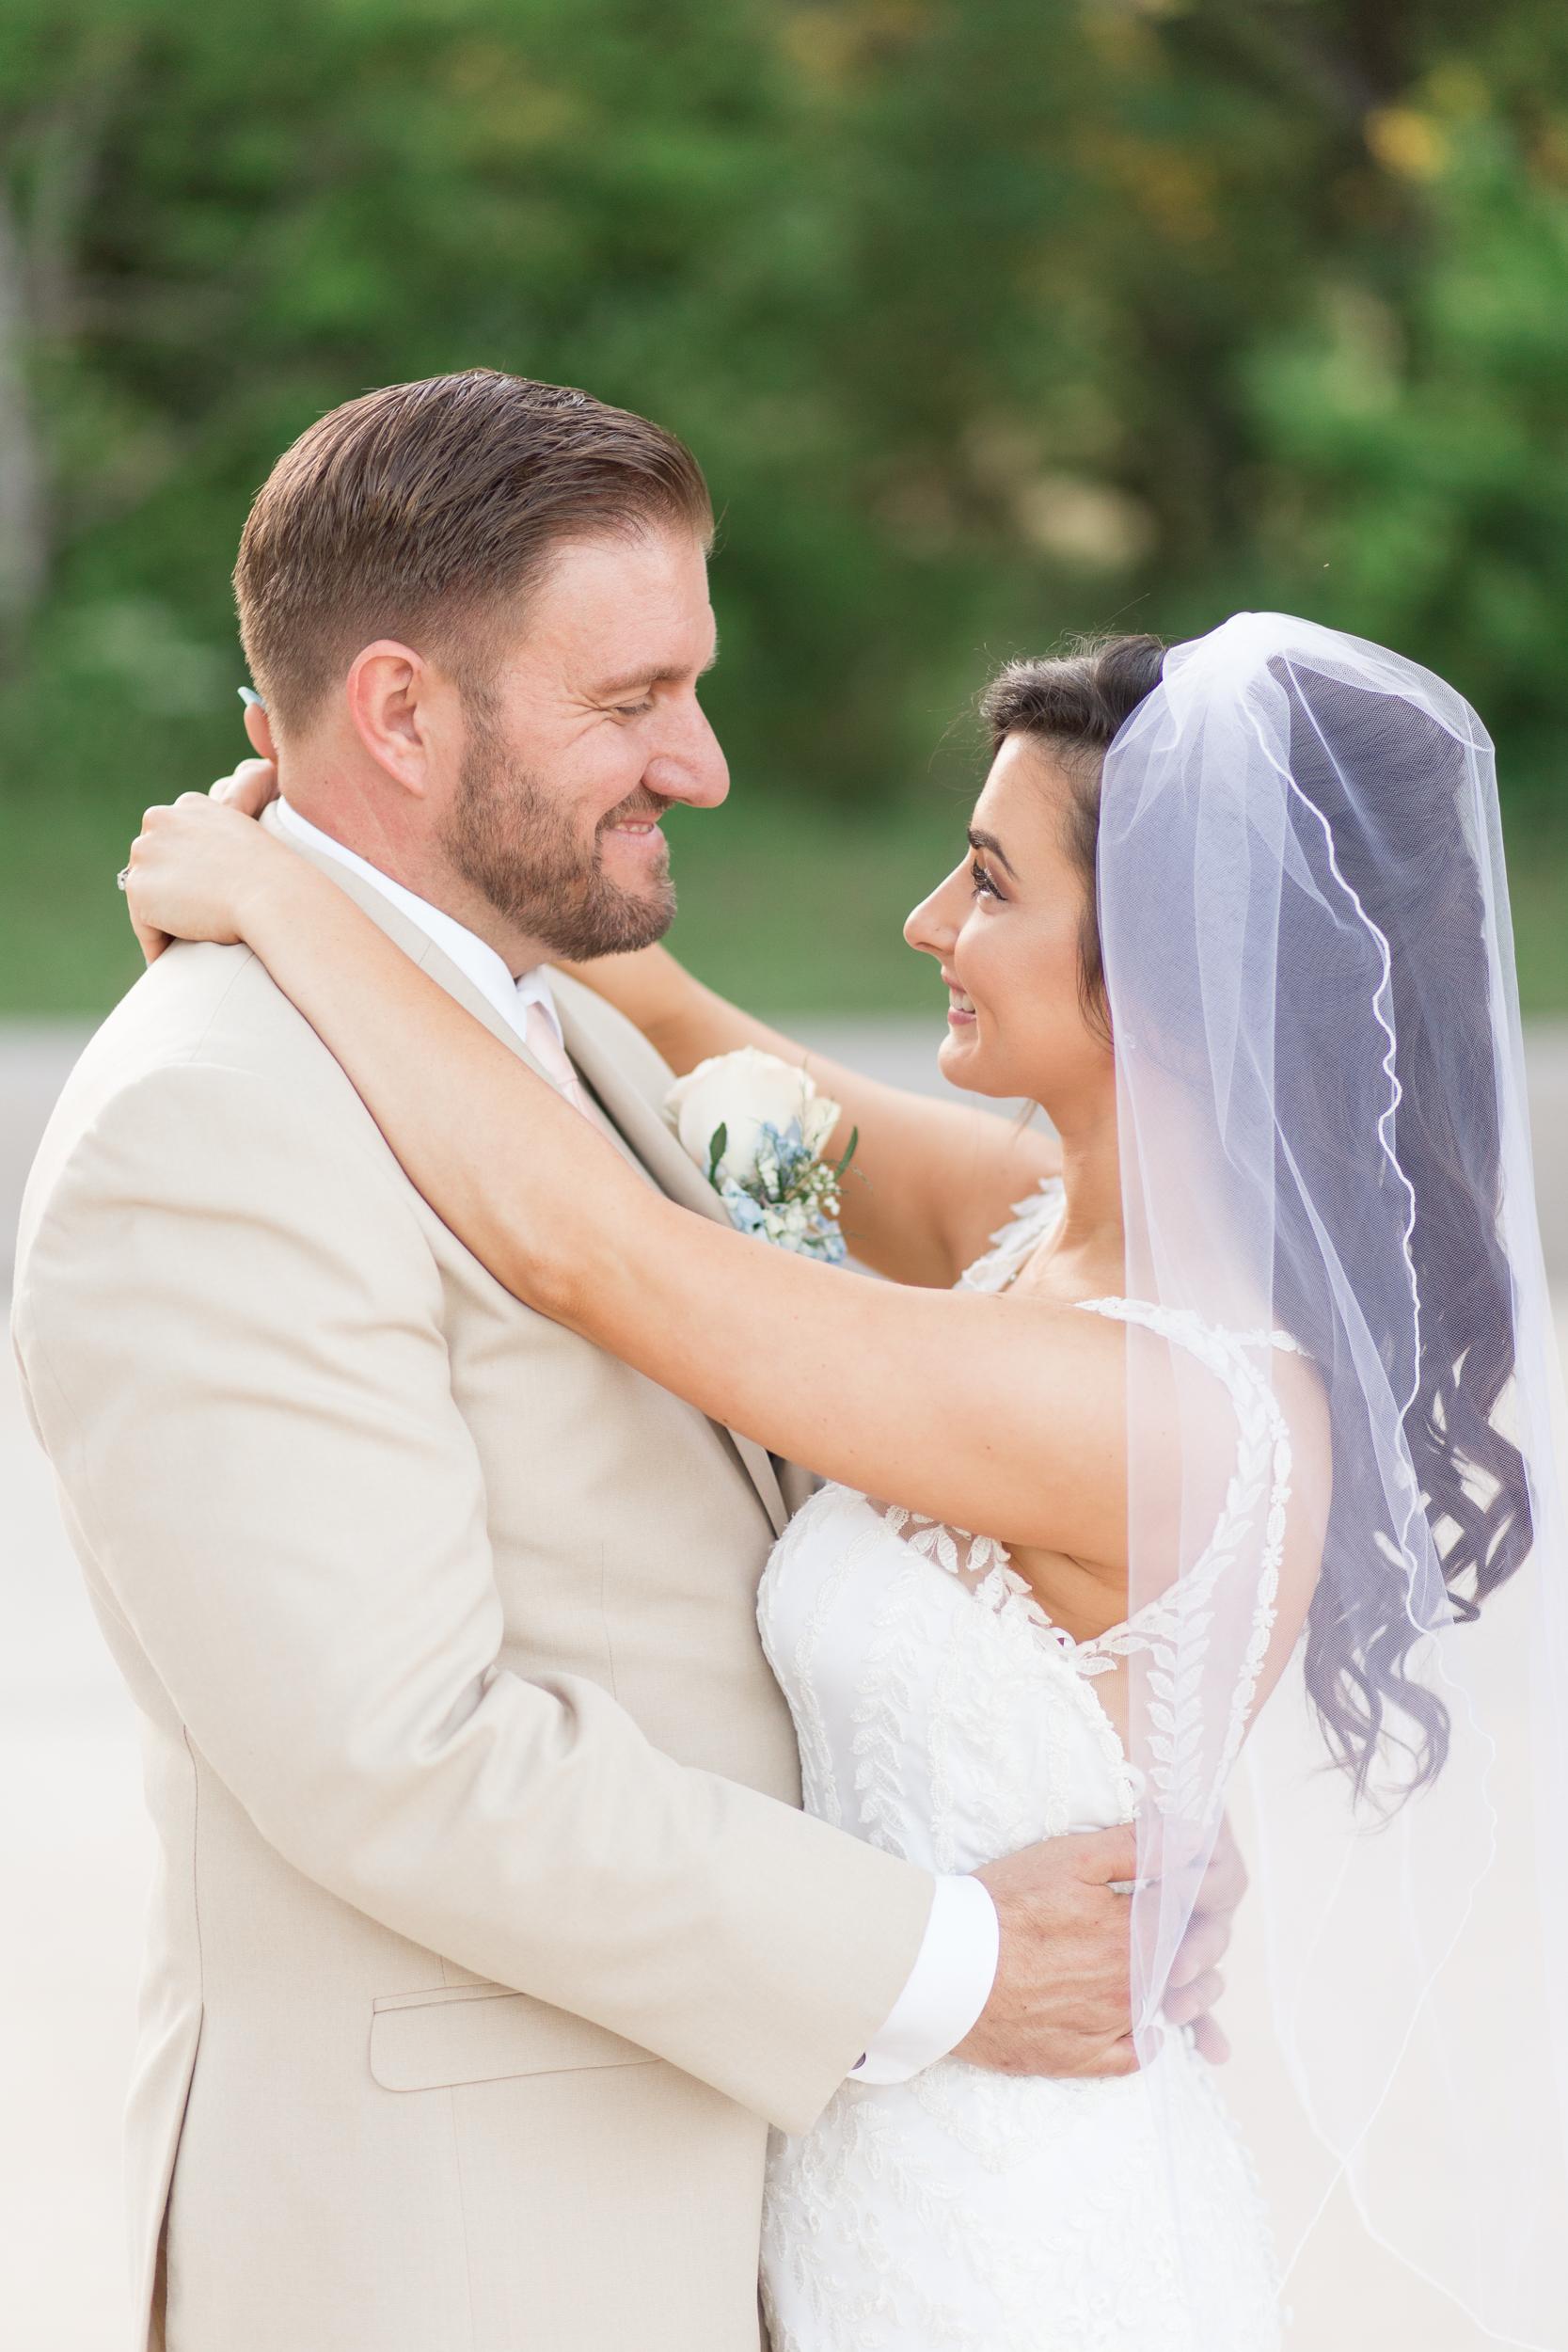 Zihlman-East TX Wedding_Kelsie Hendricks Photography_The Folmar Tyler Texas-126.jpg